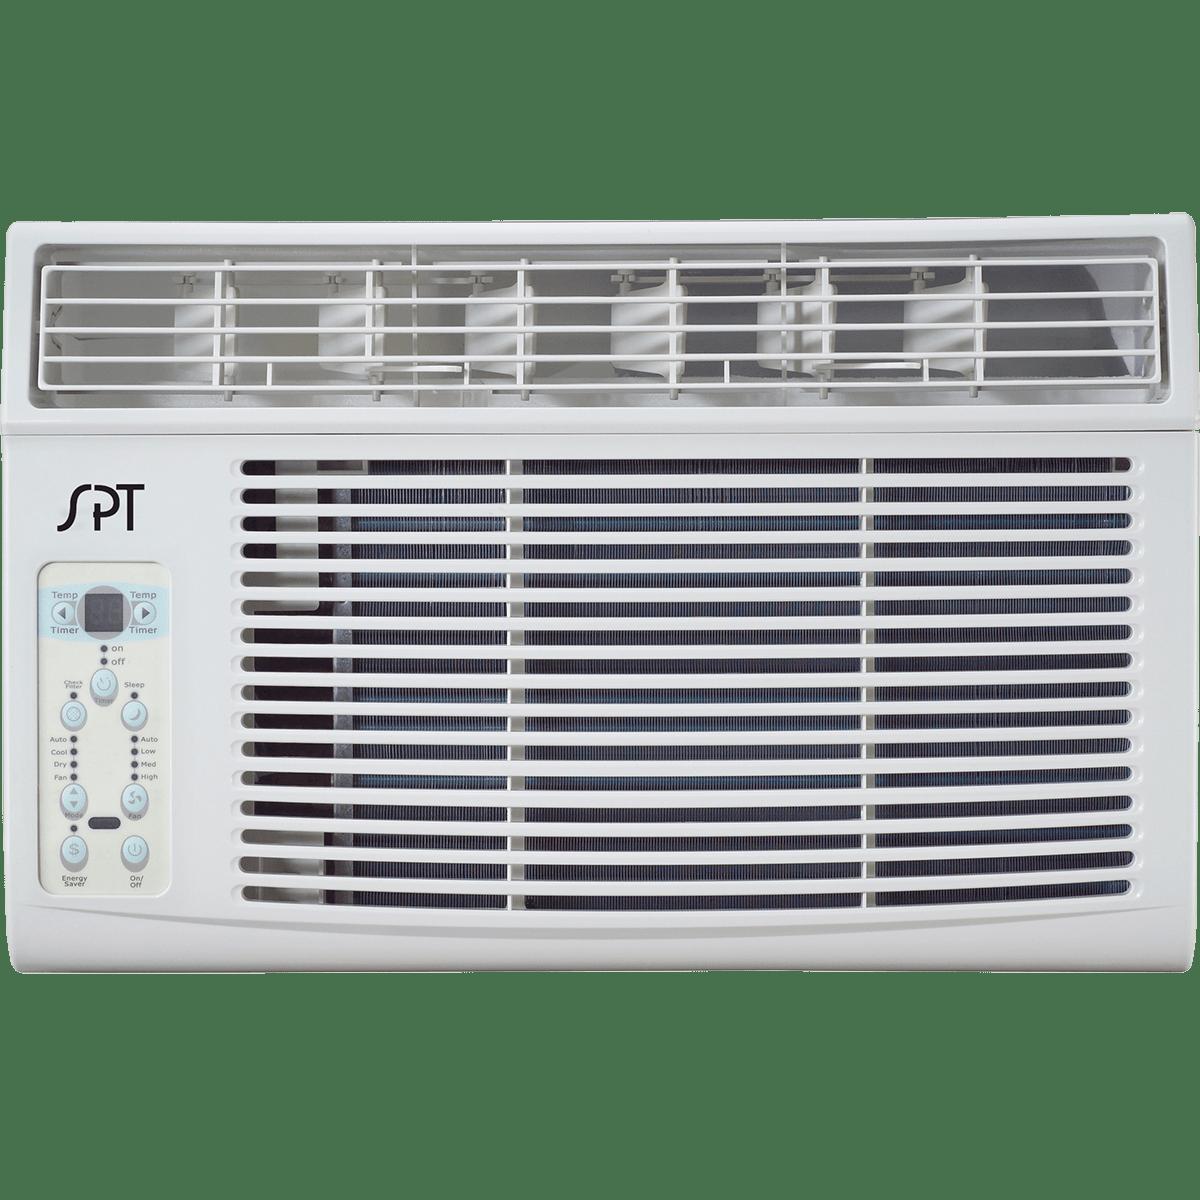 Sunpentown WA-1022S Window Air Conditioner – Energy Star